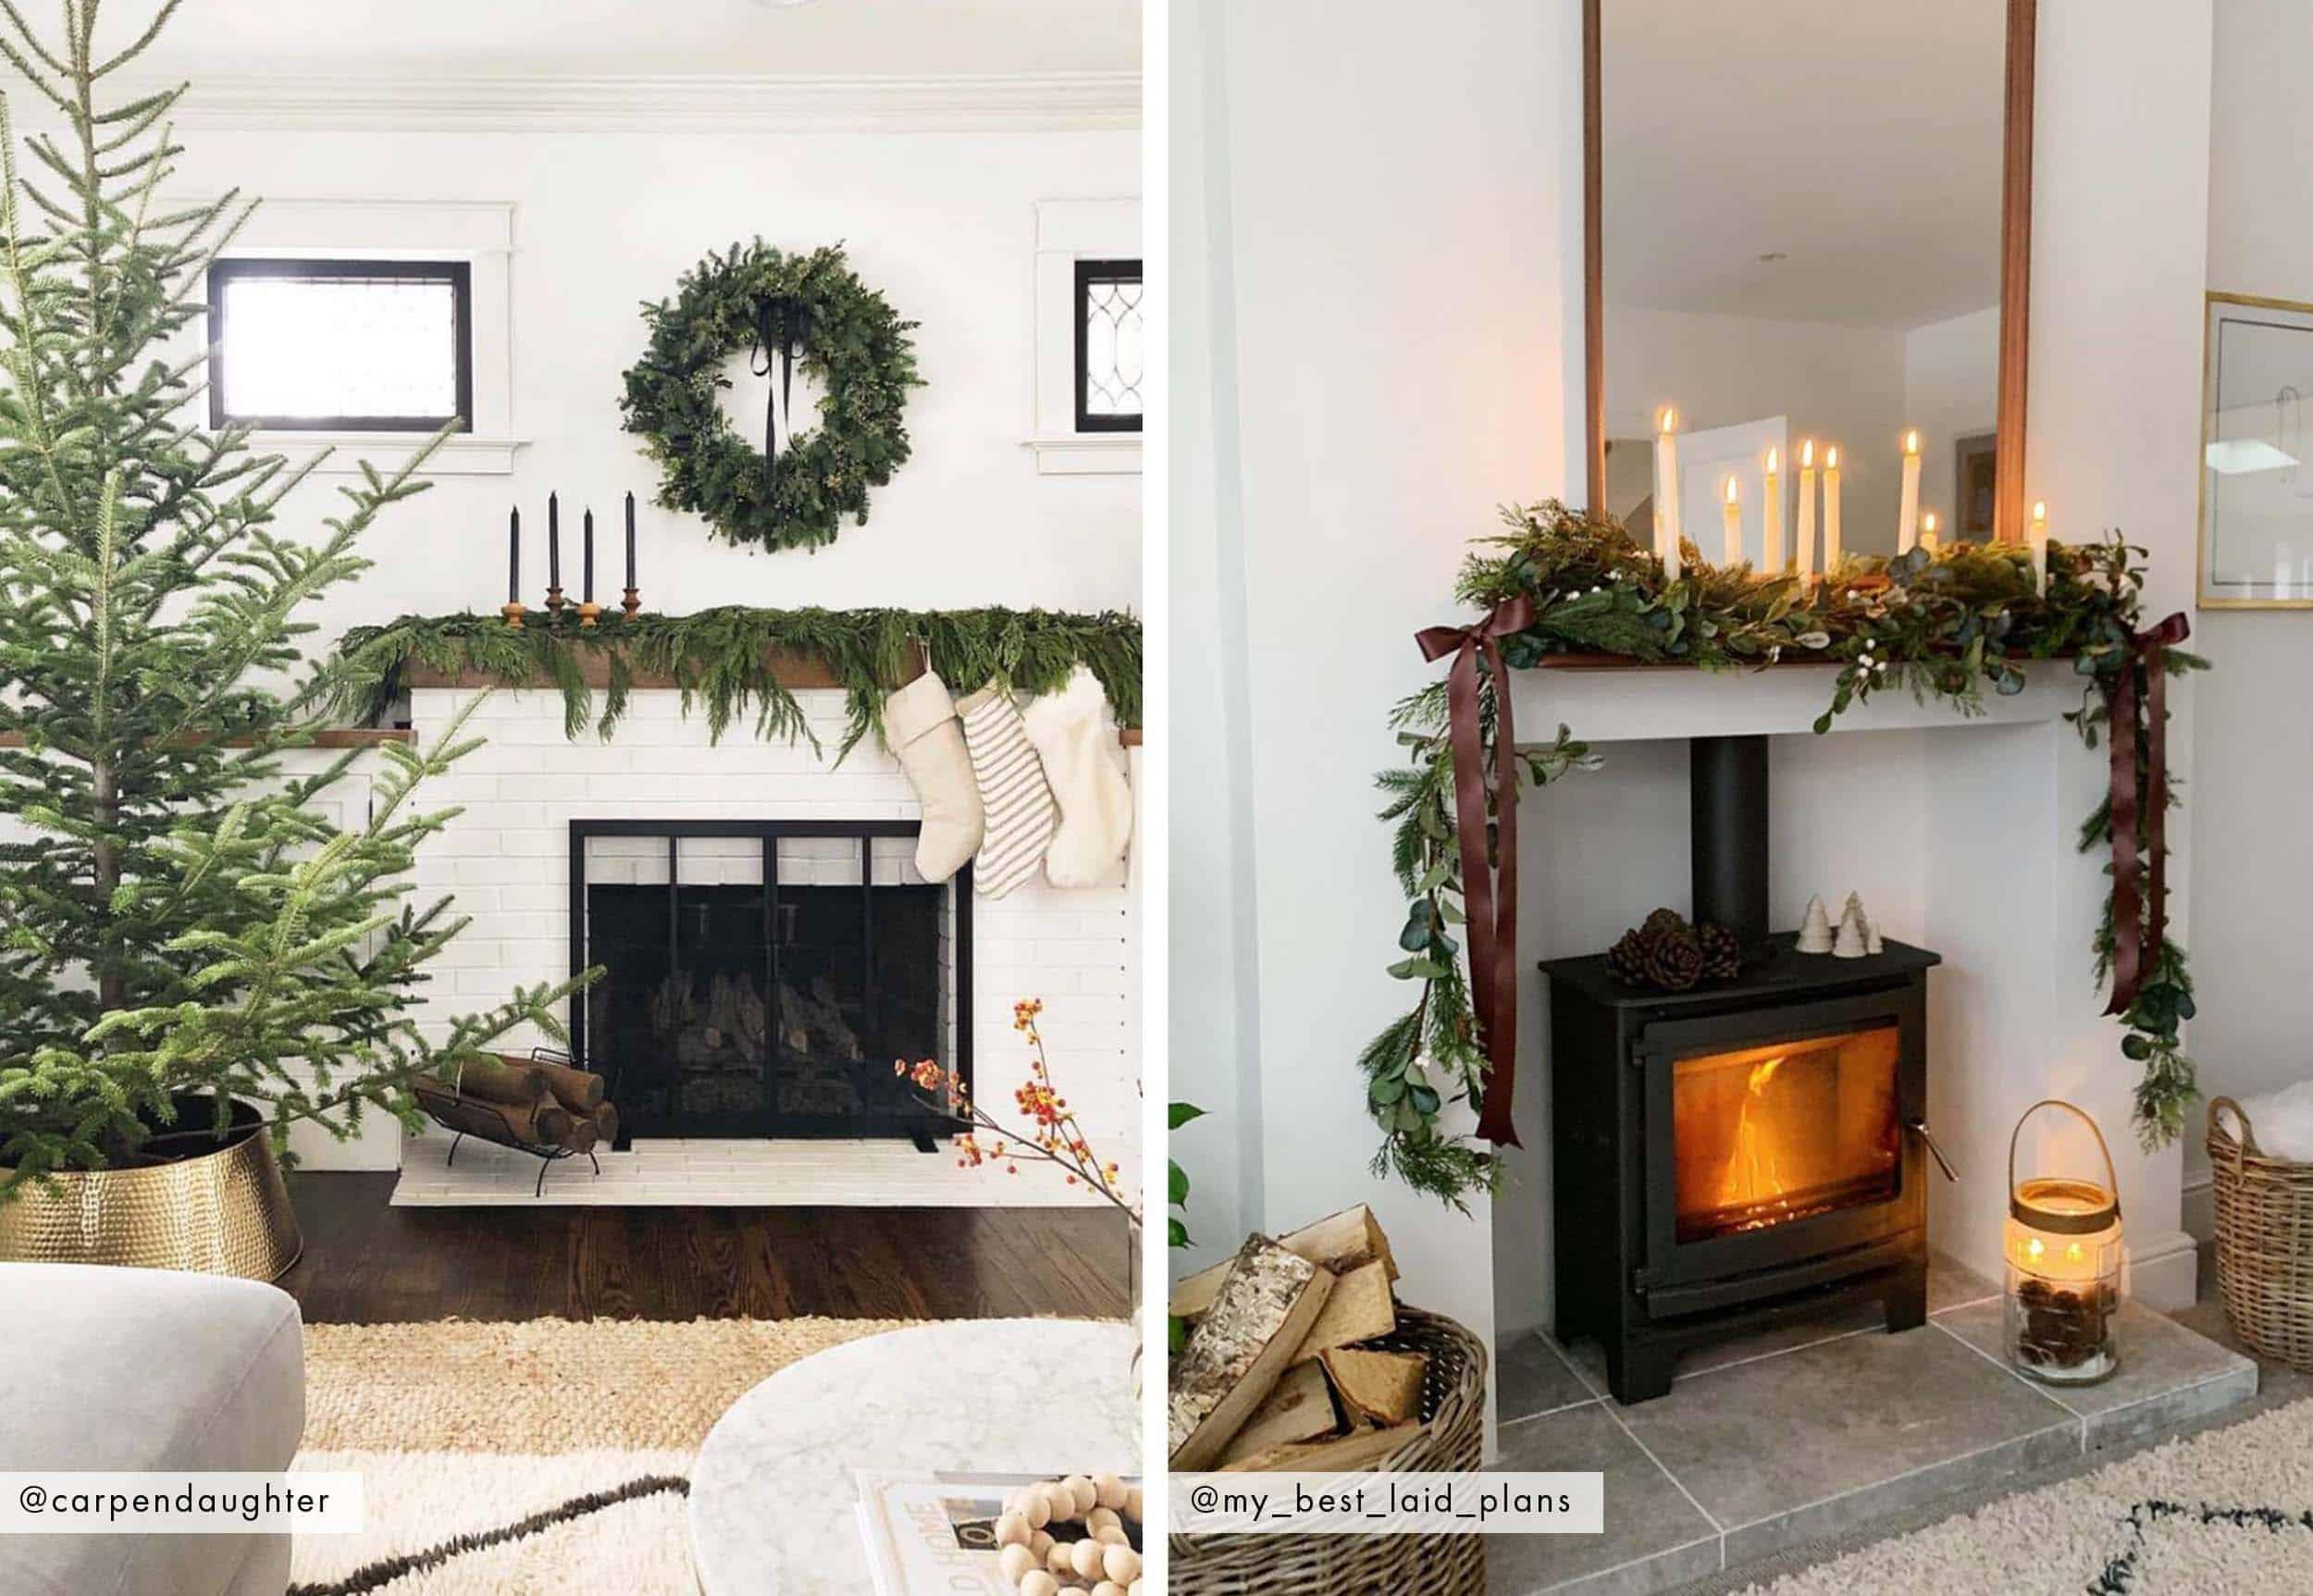 2x1 Fireplace Copy